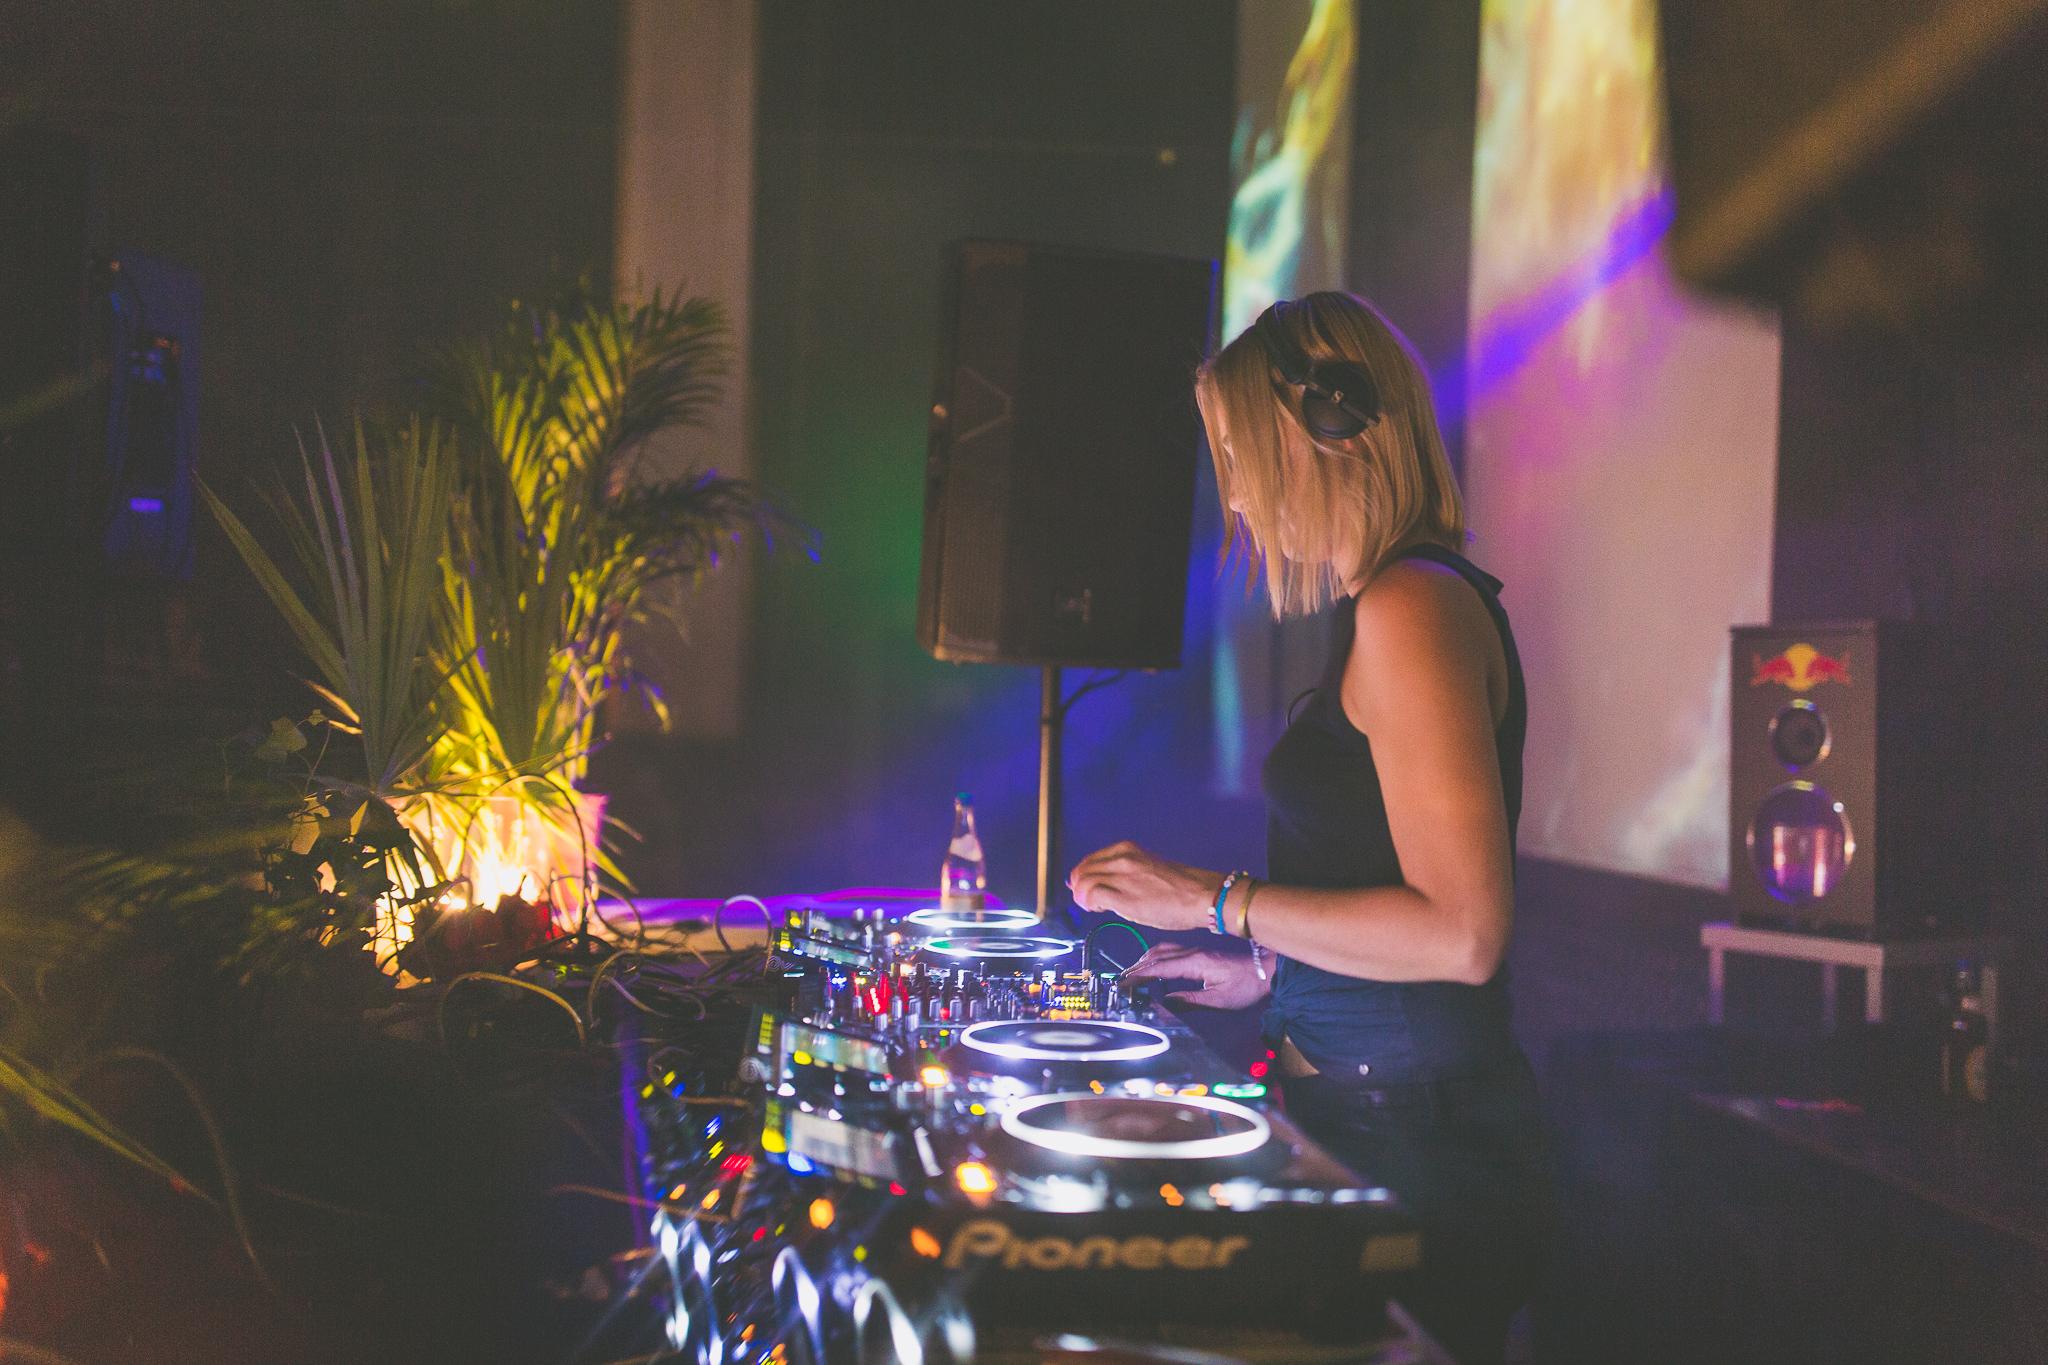 Anja Schneider • 15 IX '18